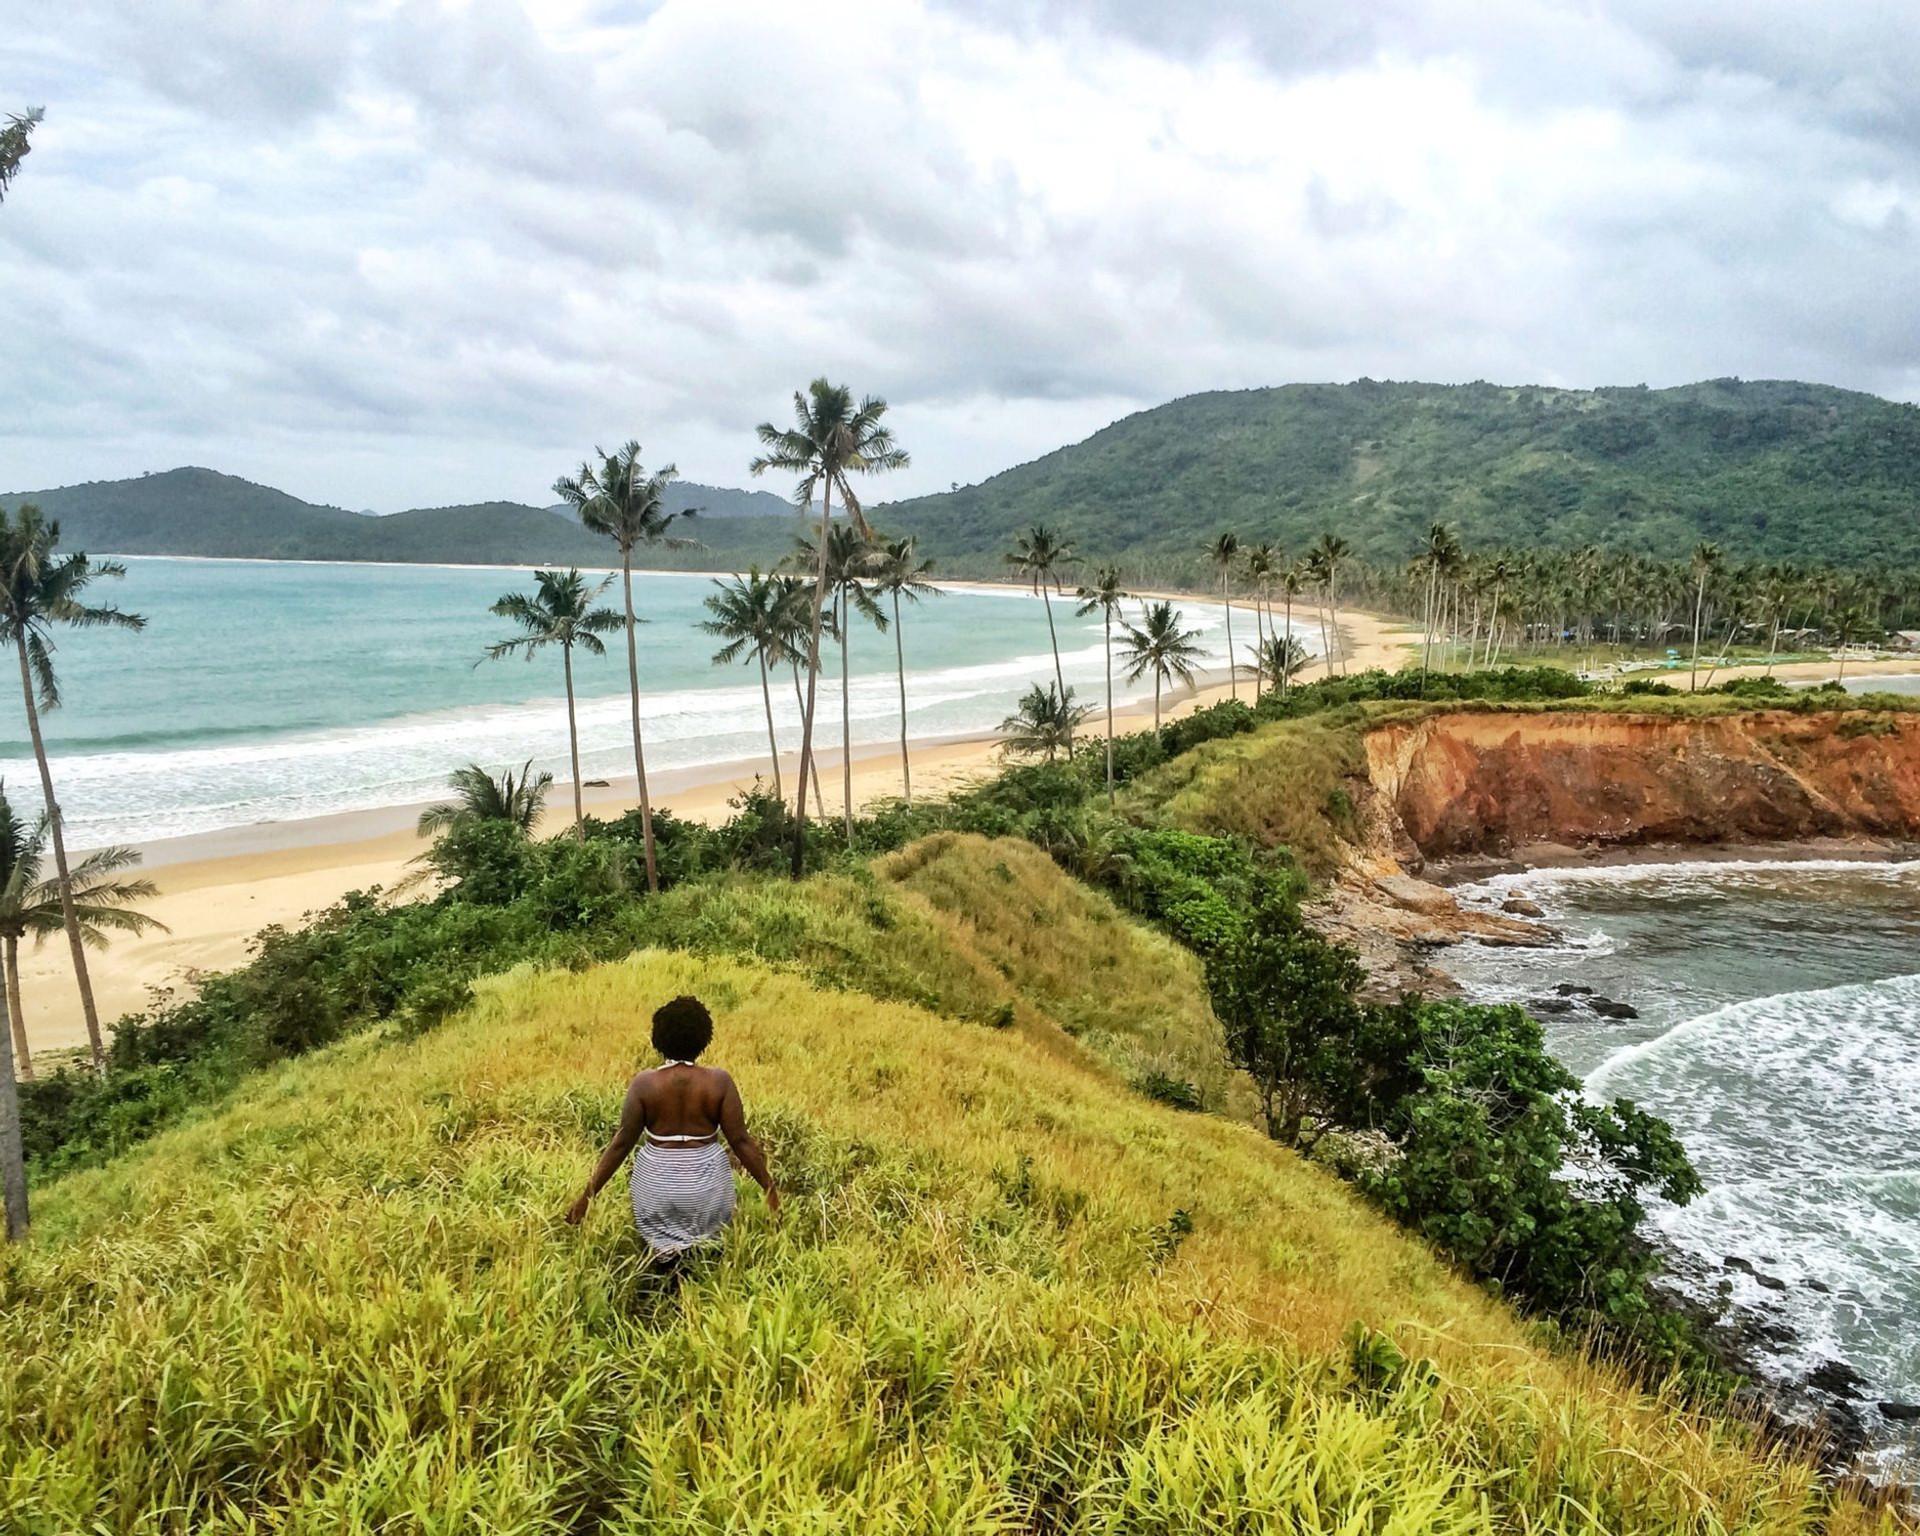 Beautiful nature on the island